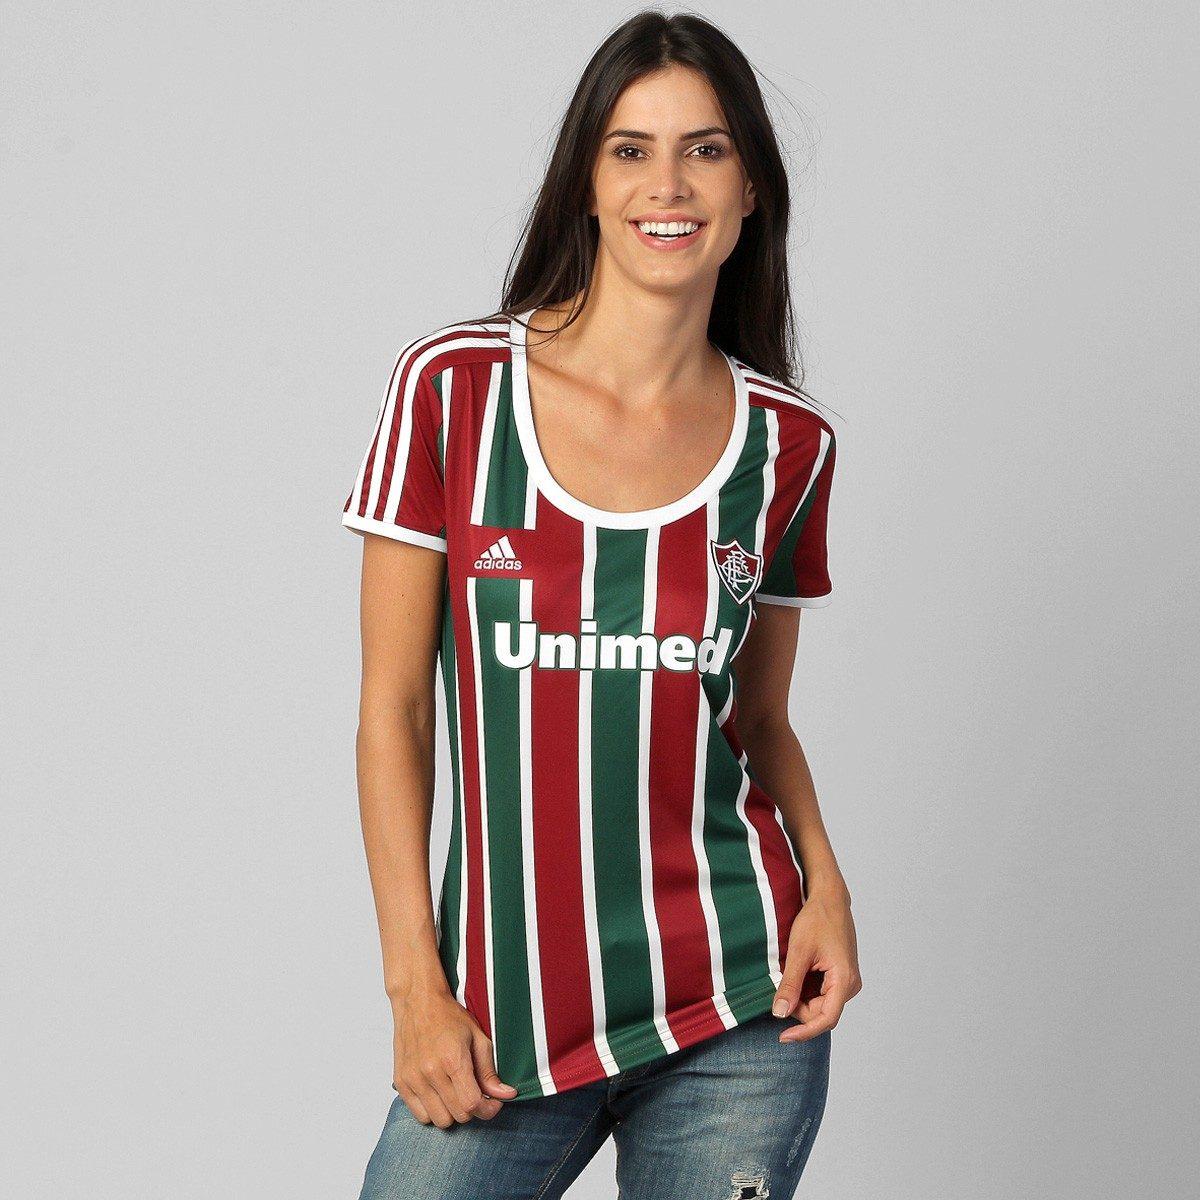 0b94ea2af8 Camisa Feminina adidas Fluminense 1 - 2014 De 199